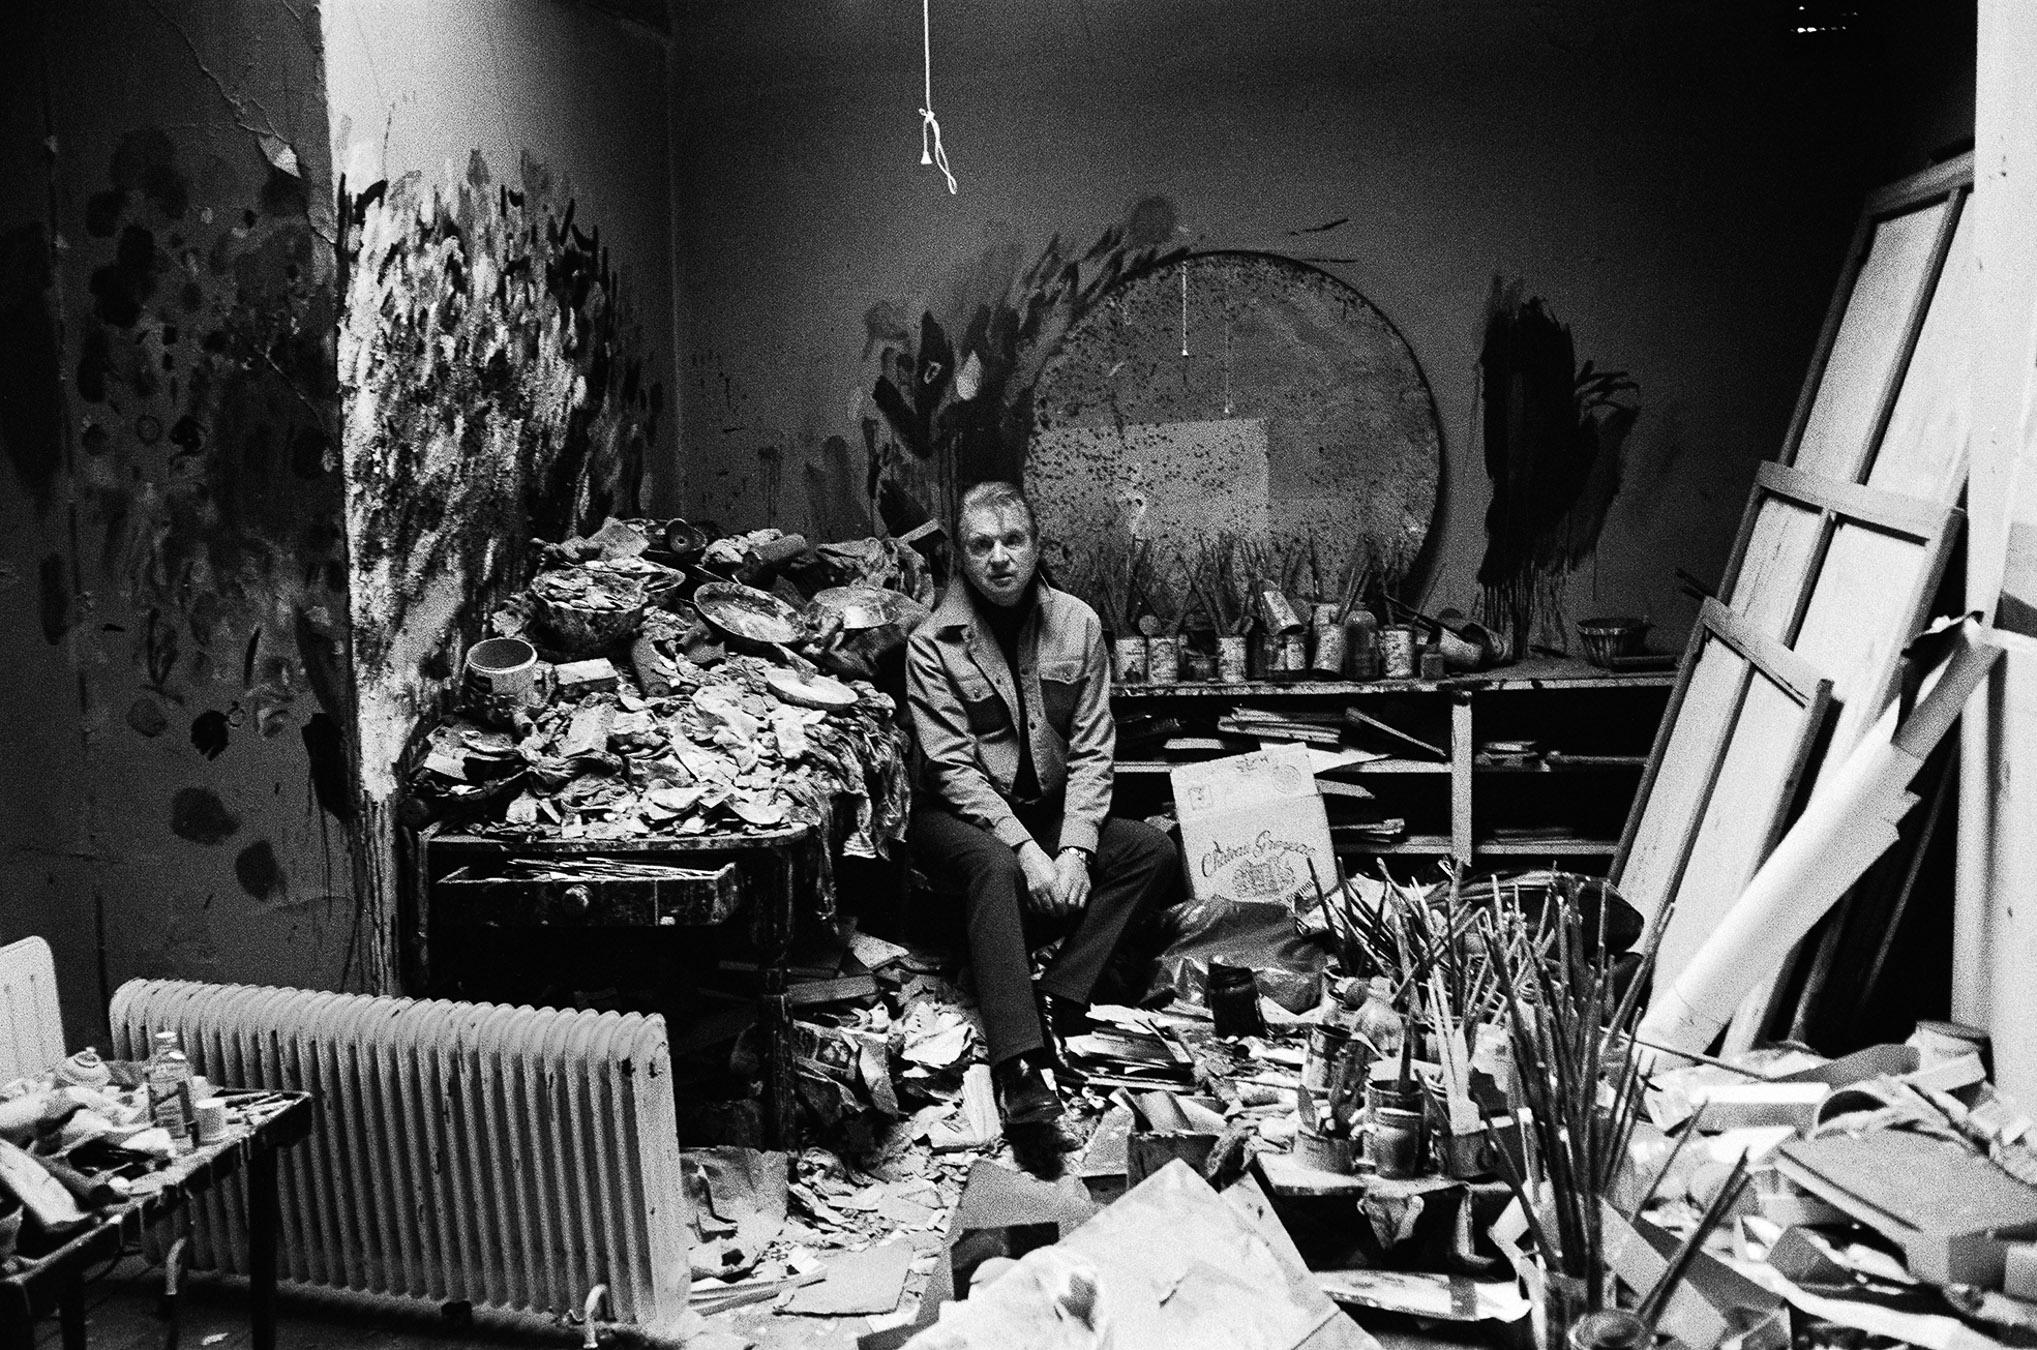 Francis Bacon in his studio, London 1979 (I) Silver gelatin print 98x64cm